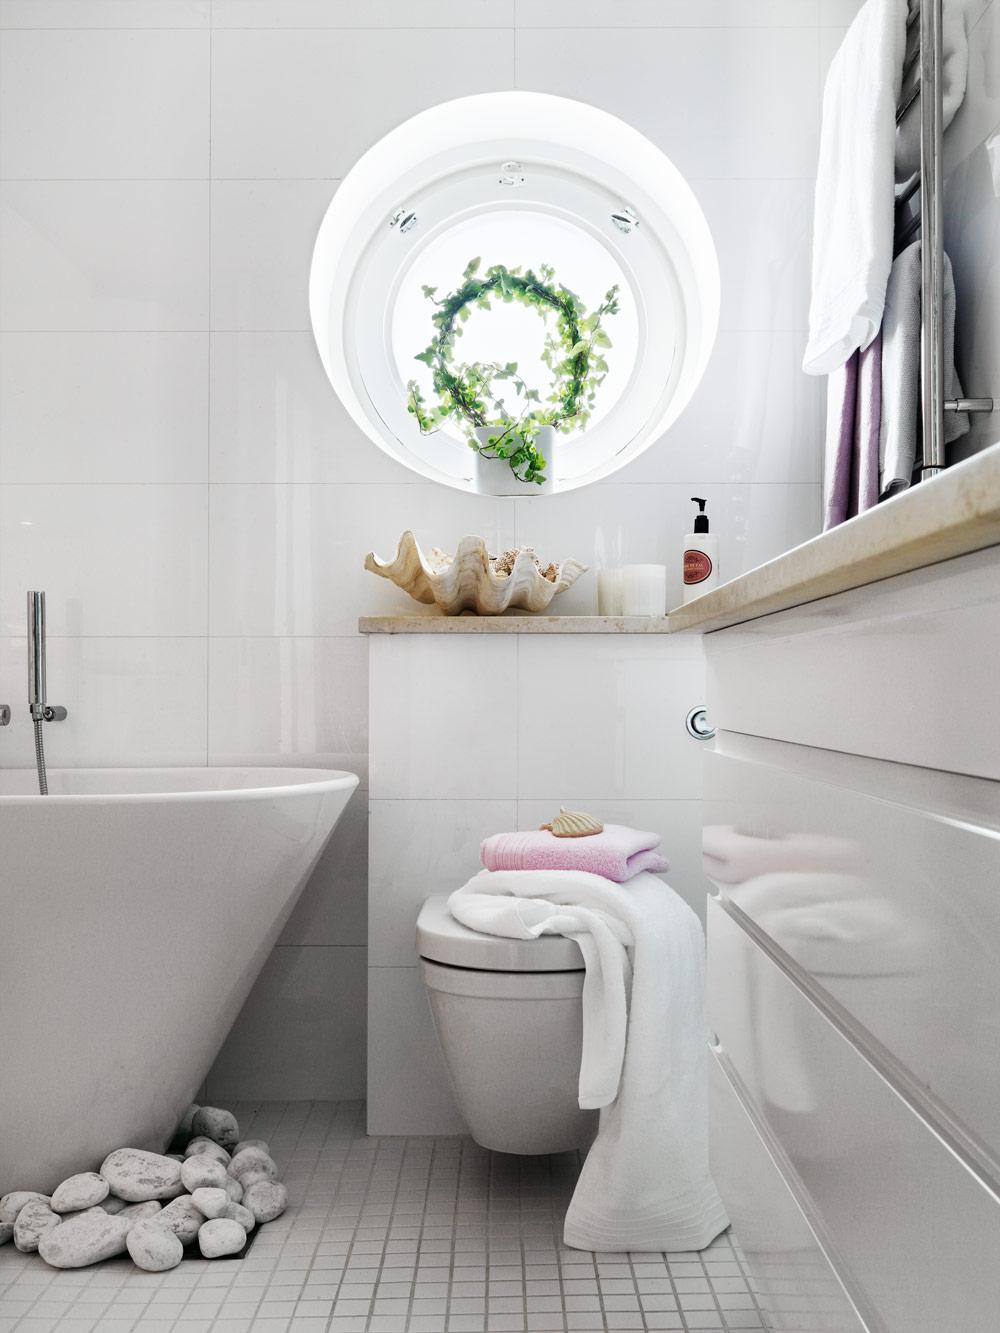 Stylish Small Bathroom With An Unusual Decor   DigsDigs on Small Bathroom Ideas Decor id=14968